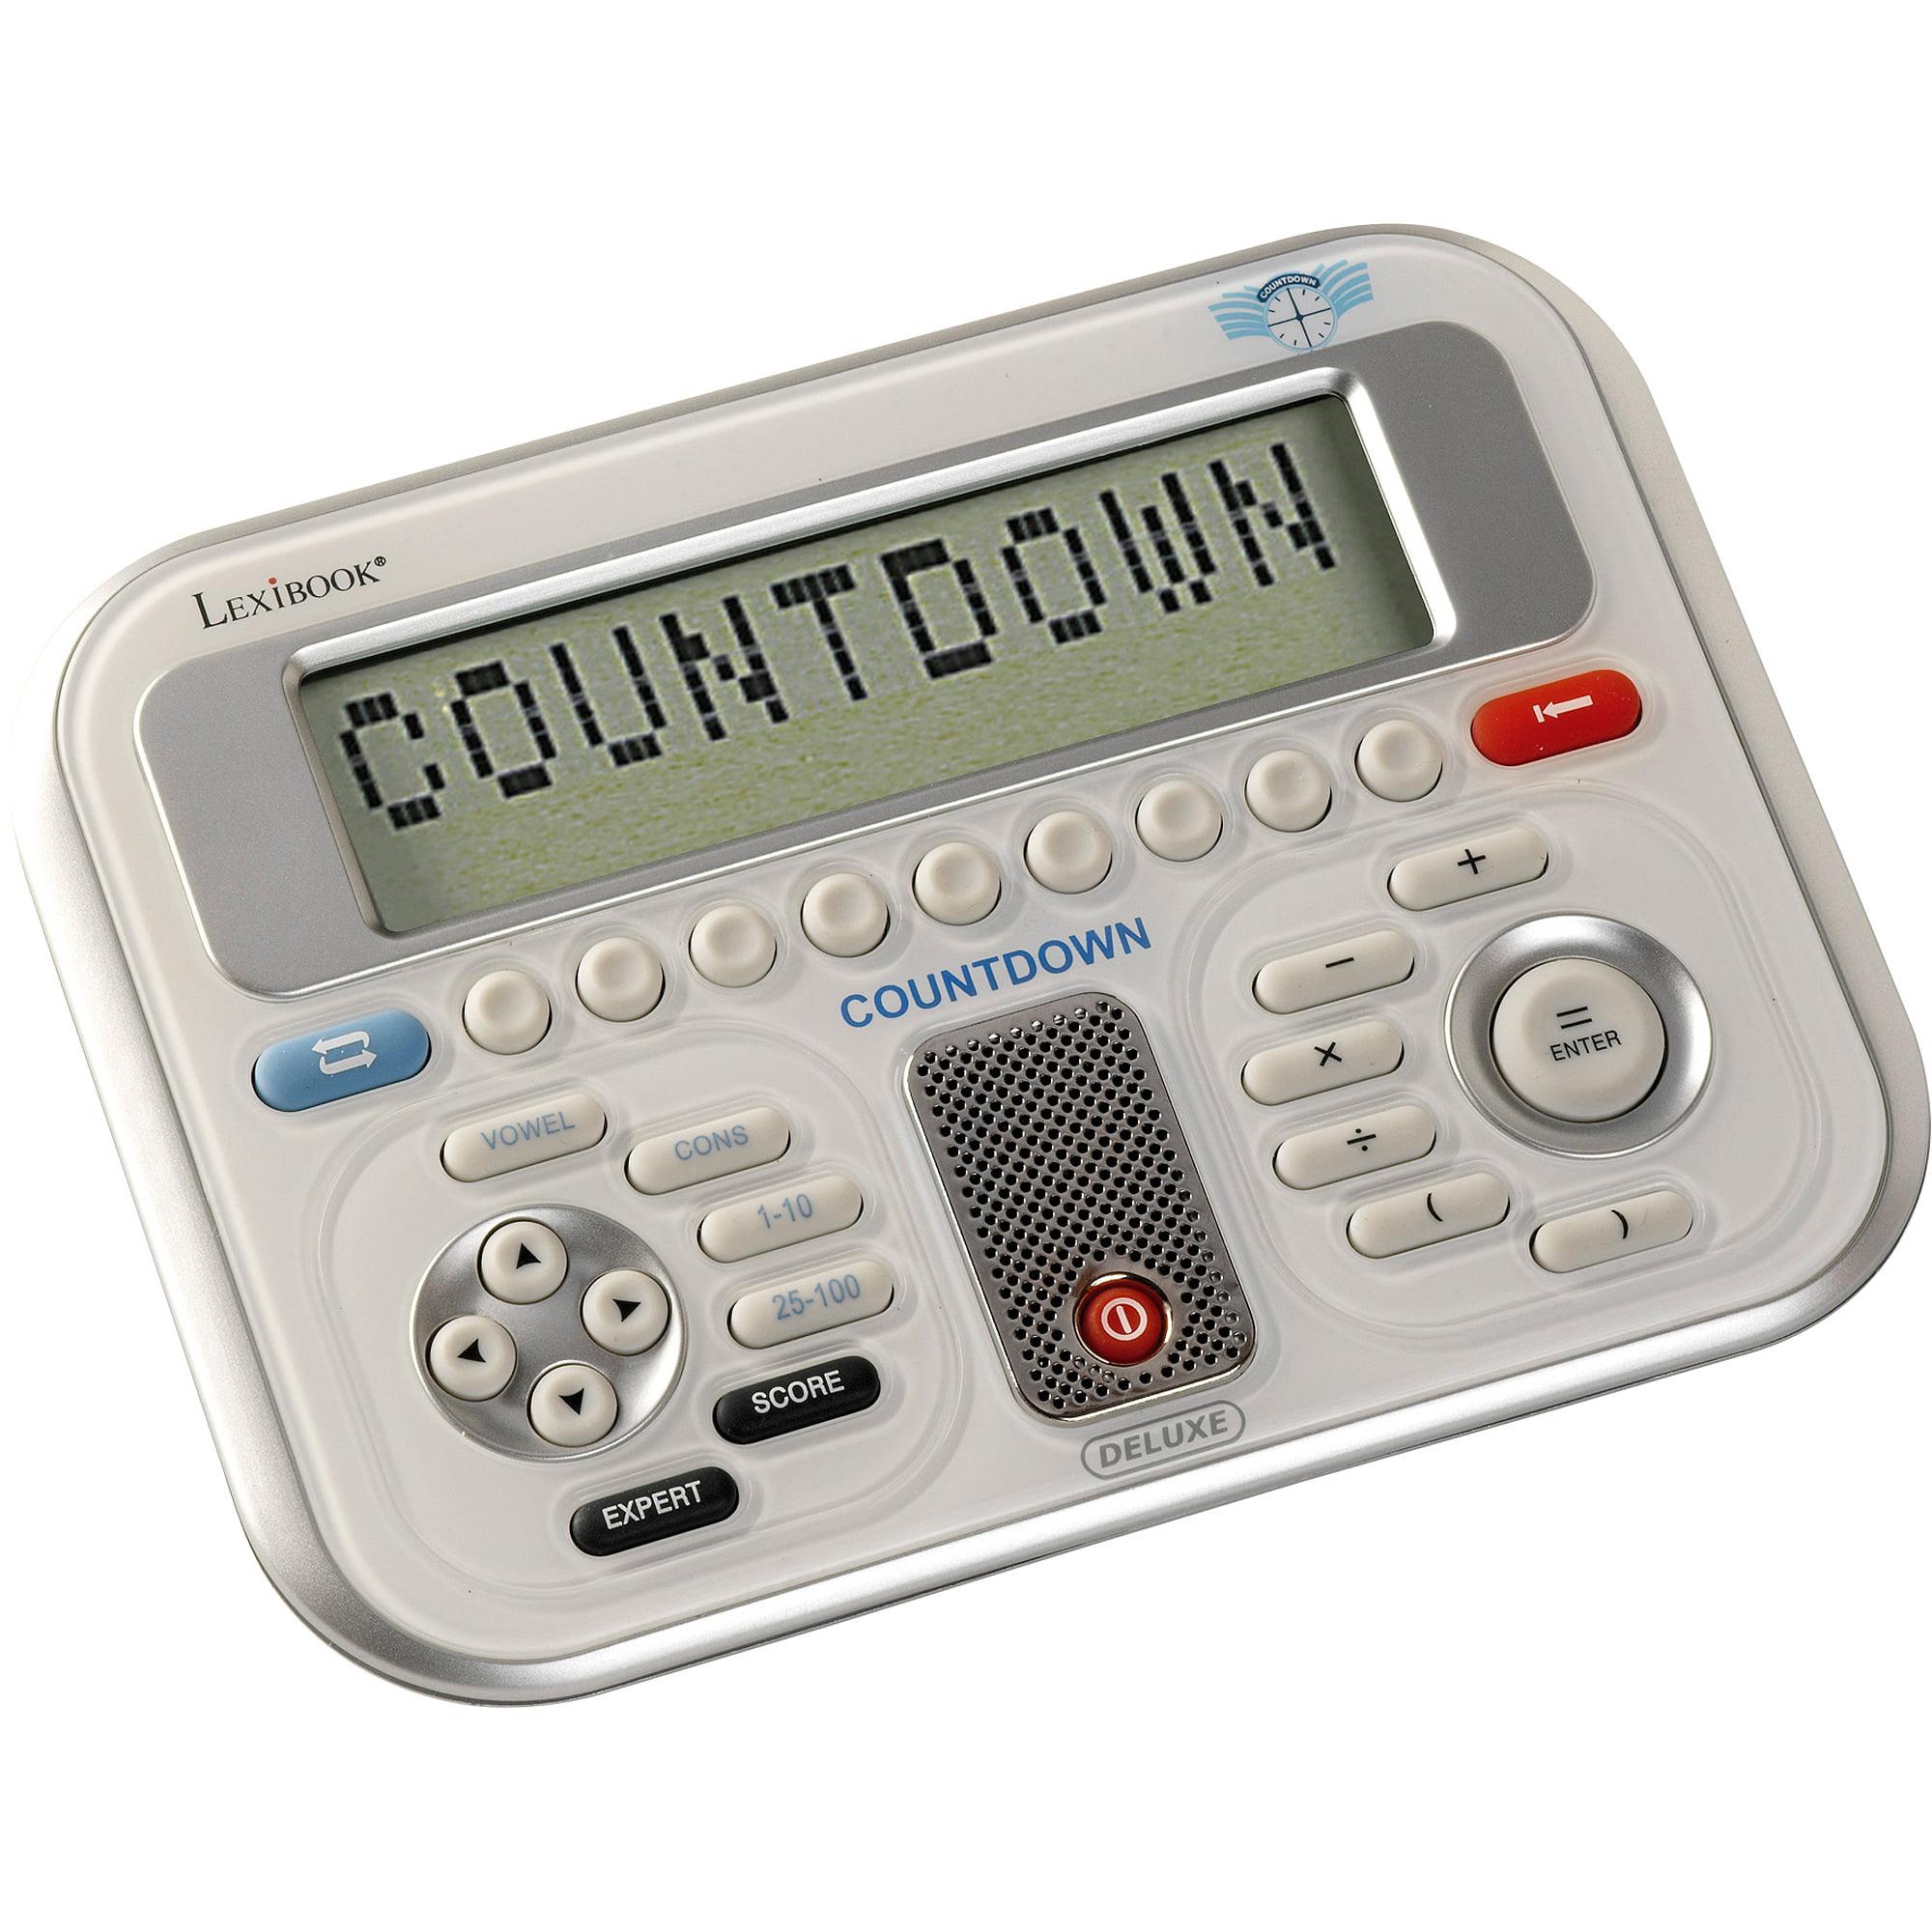 Lexibook Electronic Countdown Deluxe Game